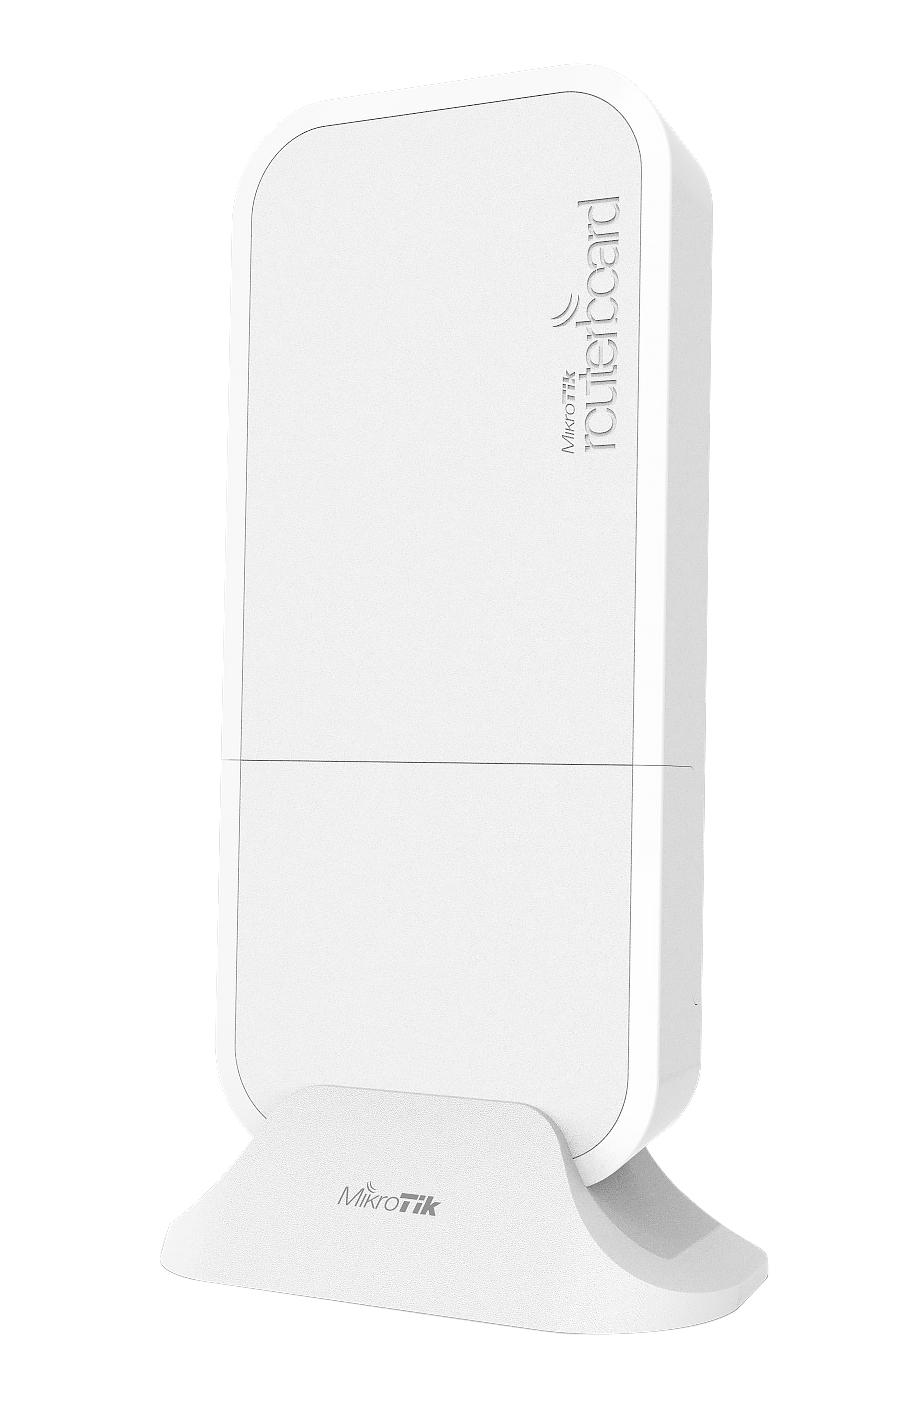 Mikrotik wAP LTE kit Power over Ethernet (PoE) White WLAN access point